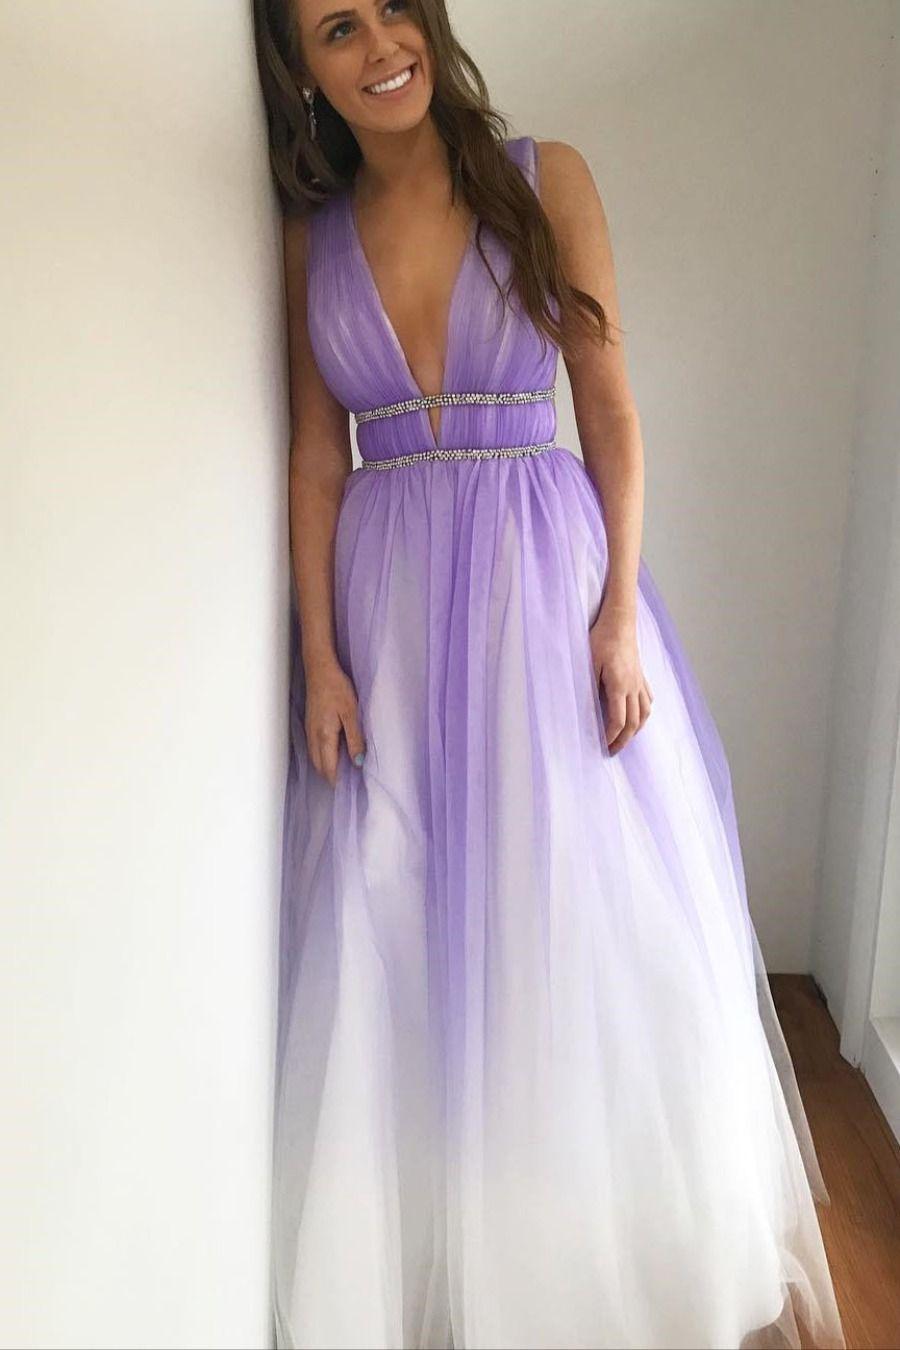 Princess A Line V Neck Ombre Purple Long Evening Dress Purple Prom Dress Ombre Prom Dresses Backless Prom Dresses [ 1350 x 900 Pixel ]